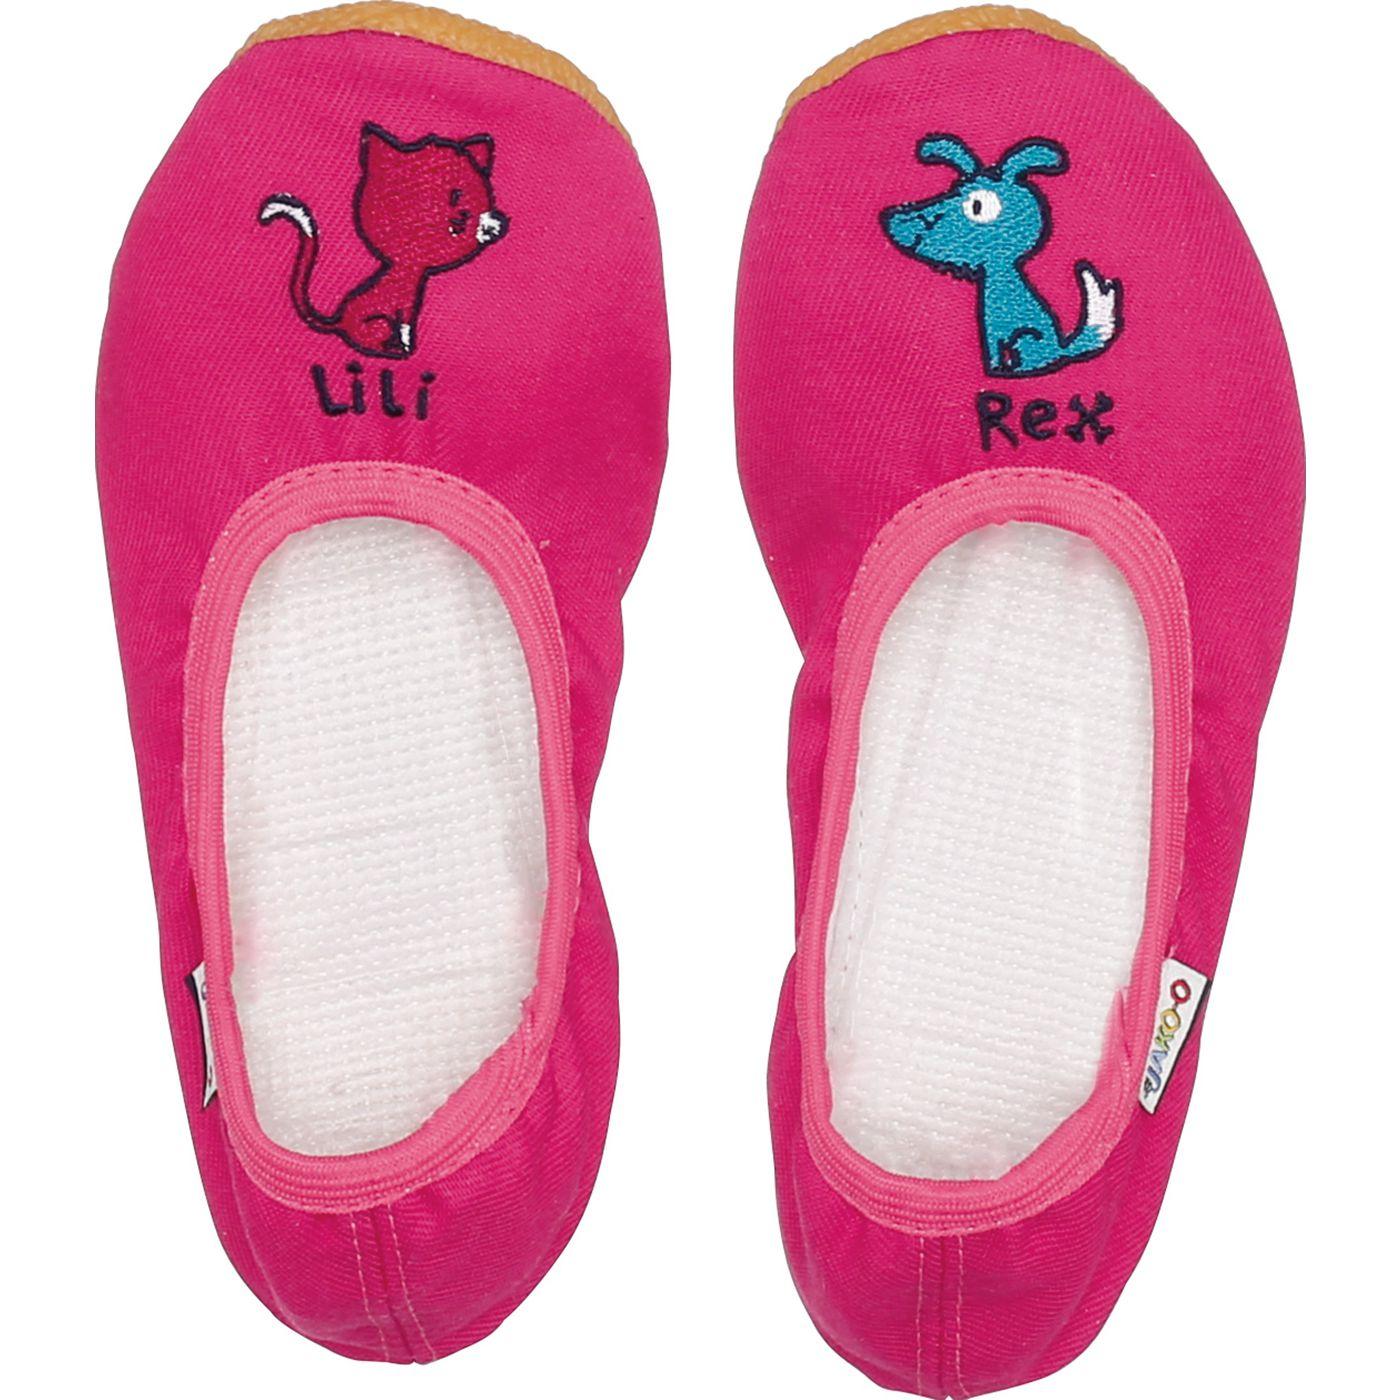 Дети гимнастика обувь Lilli & Rex